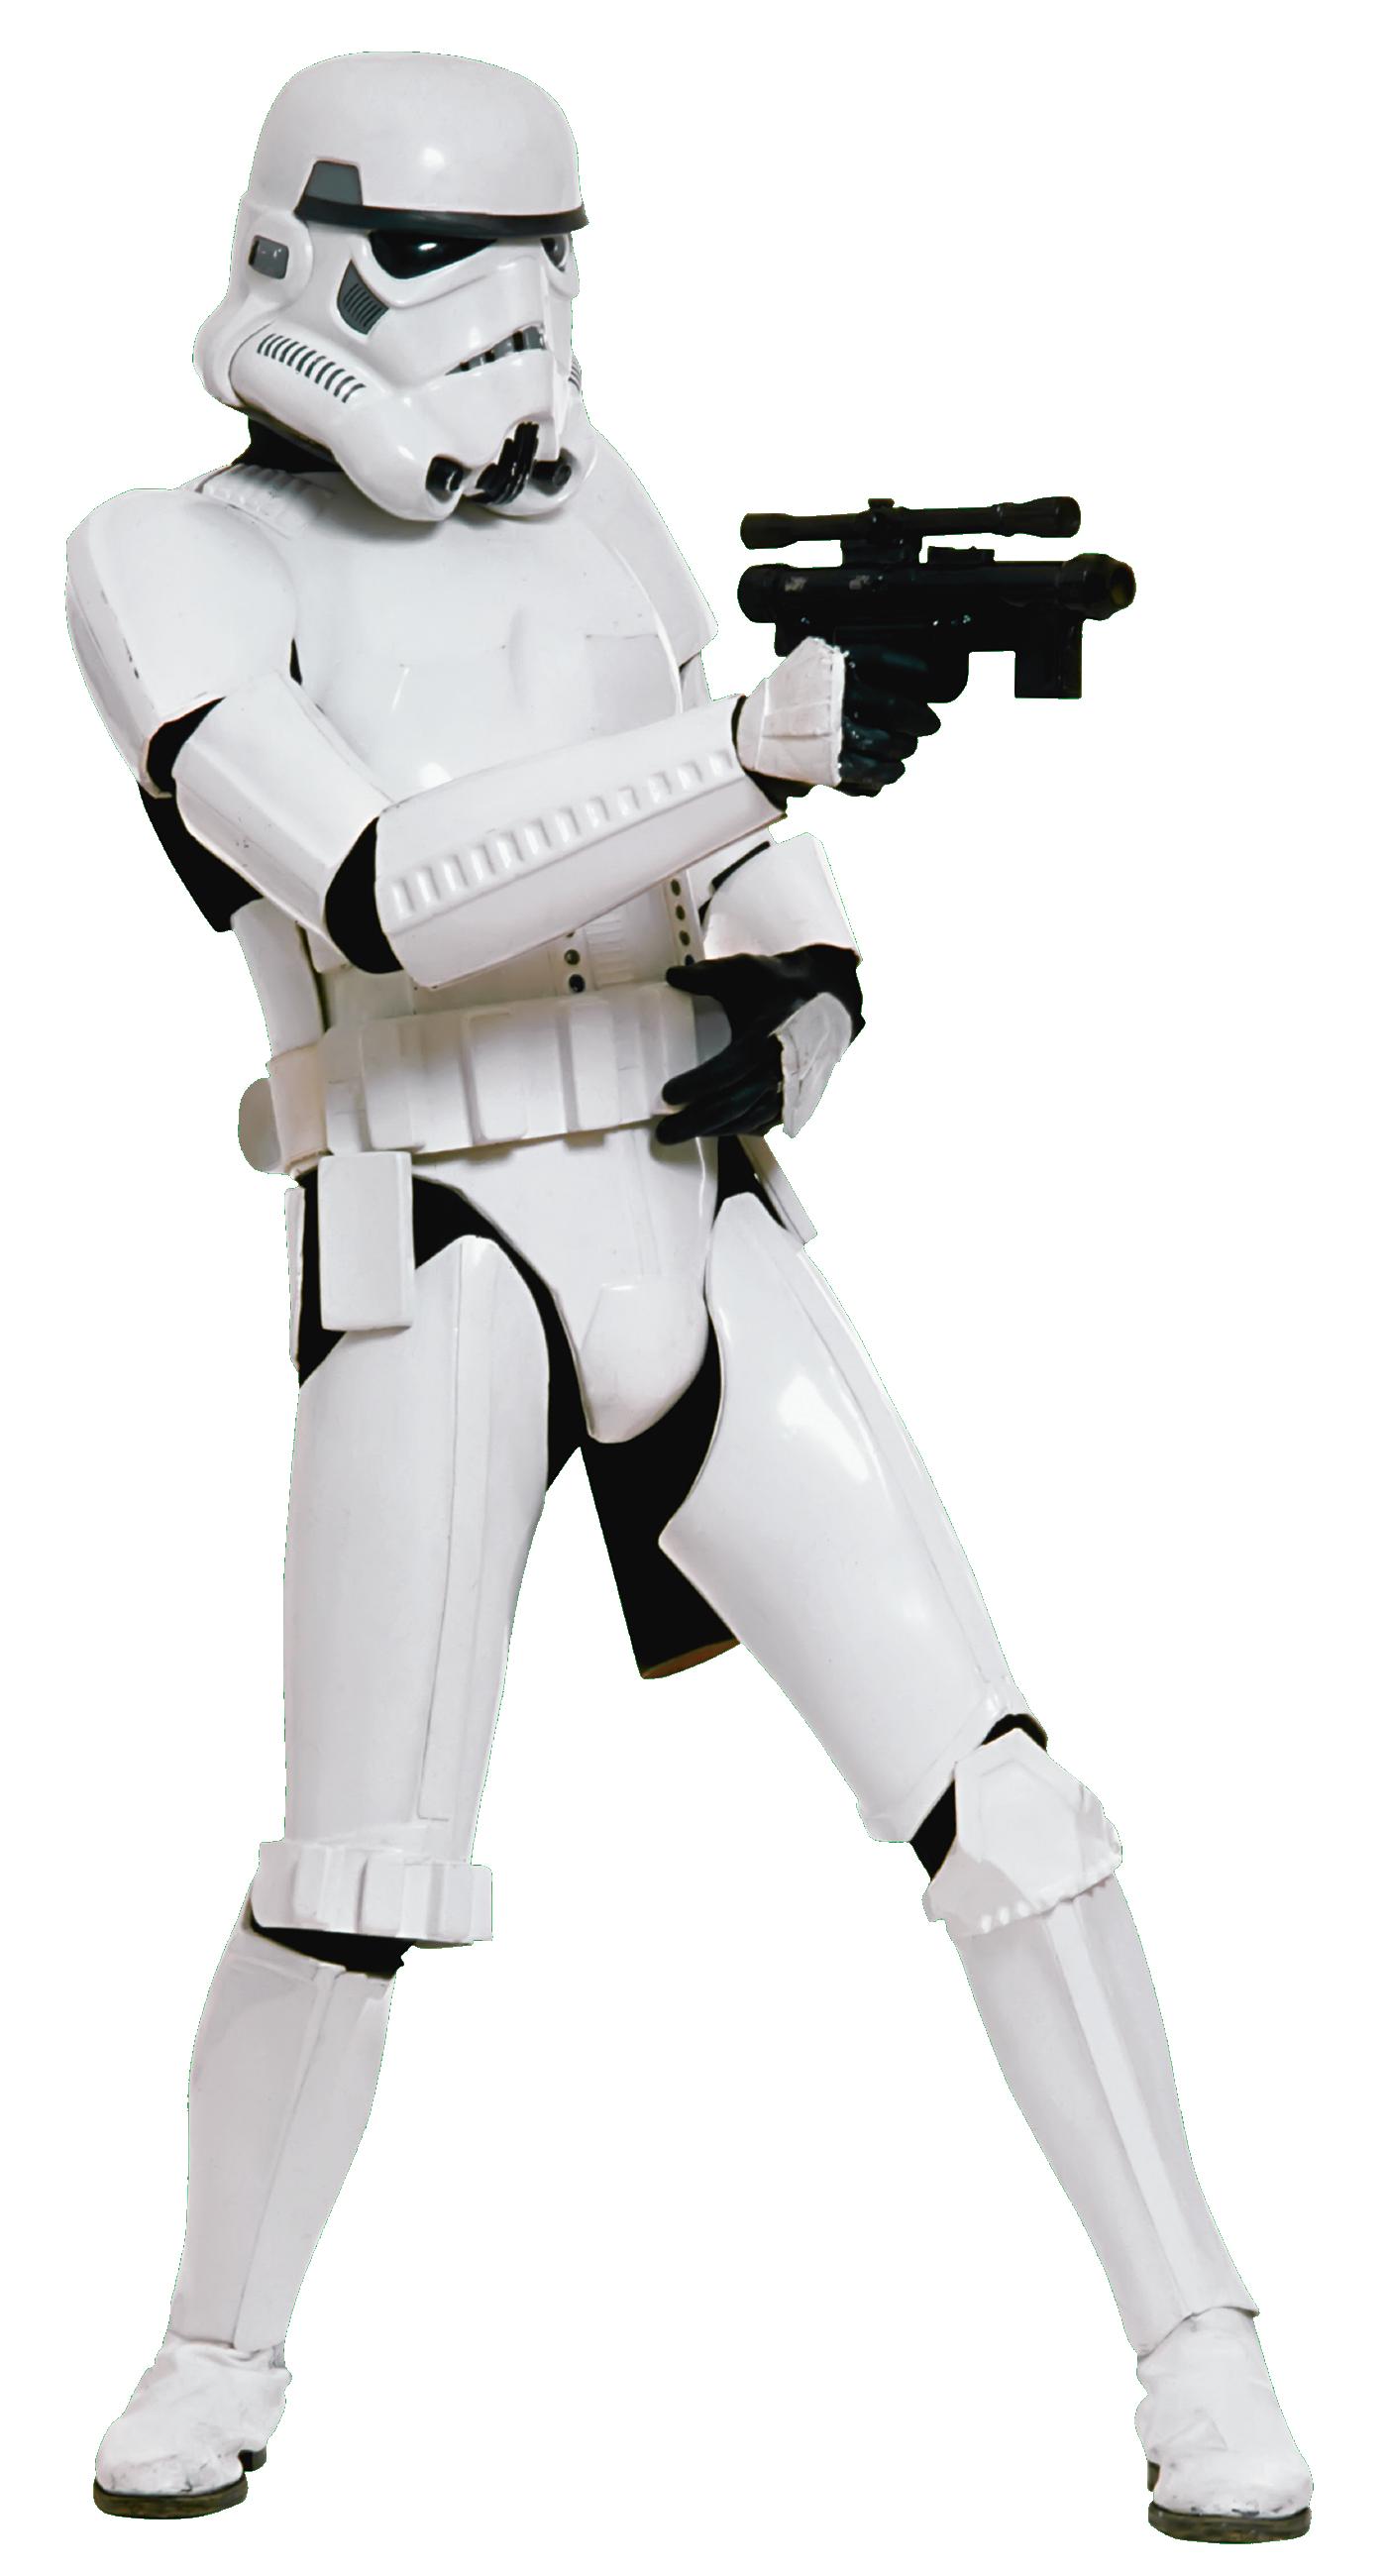 Star wars gun clipart image download Stormtrooper PNG images free download image download